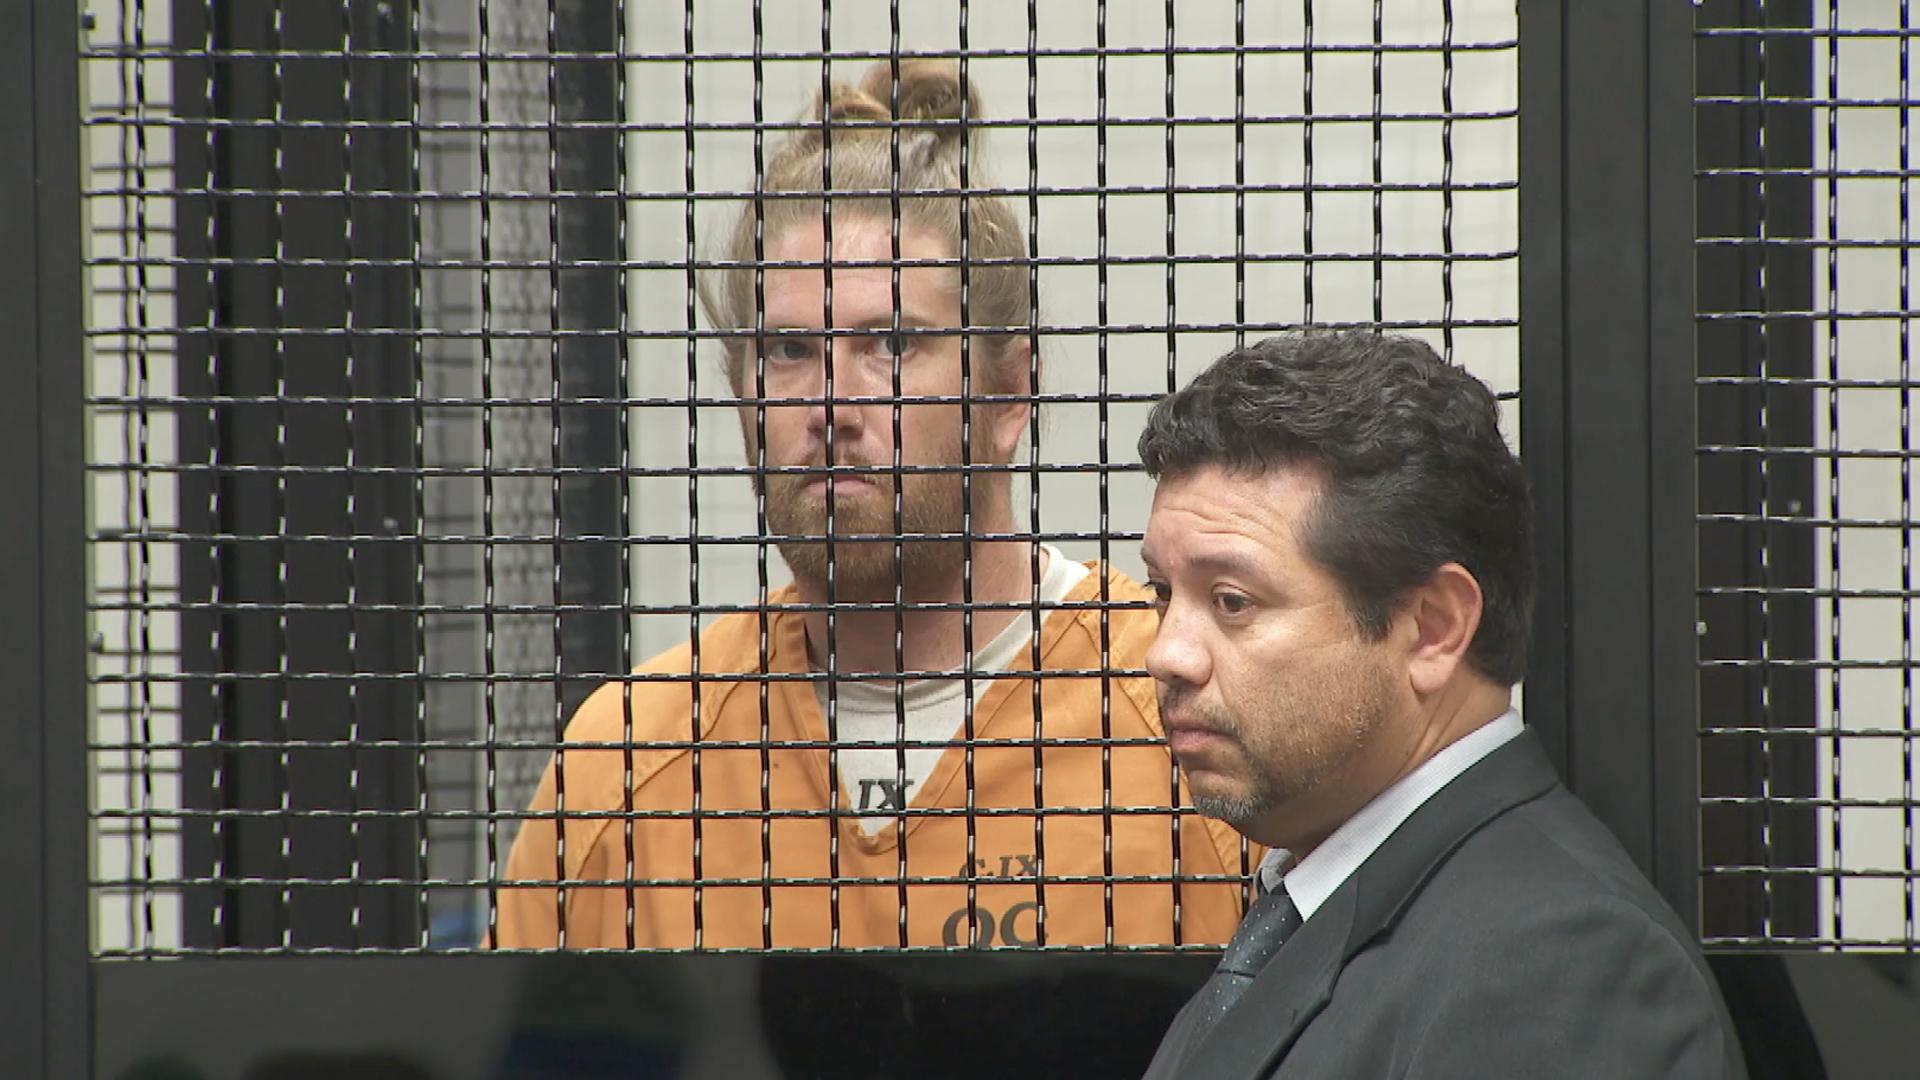 Kenneth Heimlich appears in a Fullerton courtroom on June 24, 2019. (Credit: KTLA)